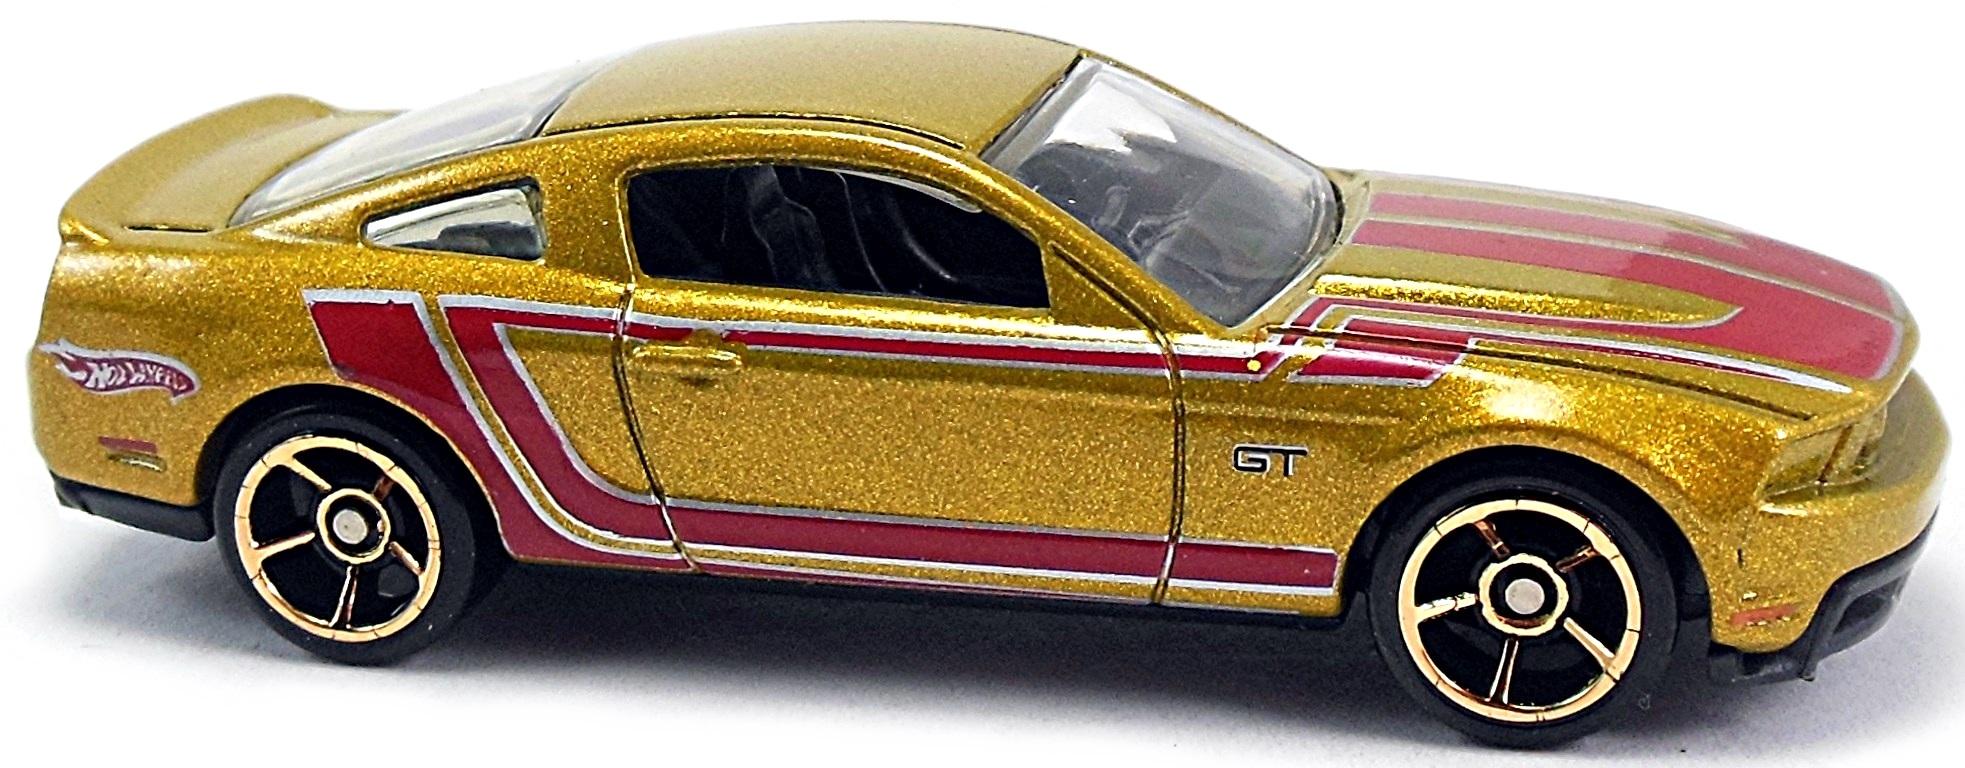 HW Garage #069 (2010) 1 – 2 h. black, black base, yellow int., tinted  windows, yellow stripes on top and sides, pr5bkyw-rim Mal. HW Garage #069 ( 2010) 1 – 2